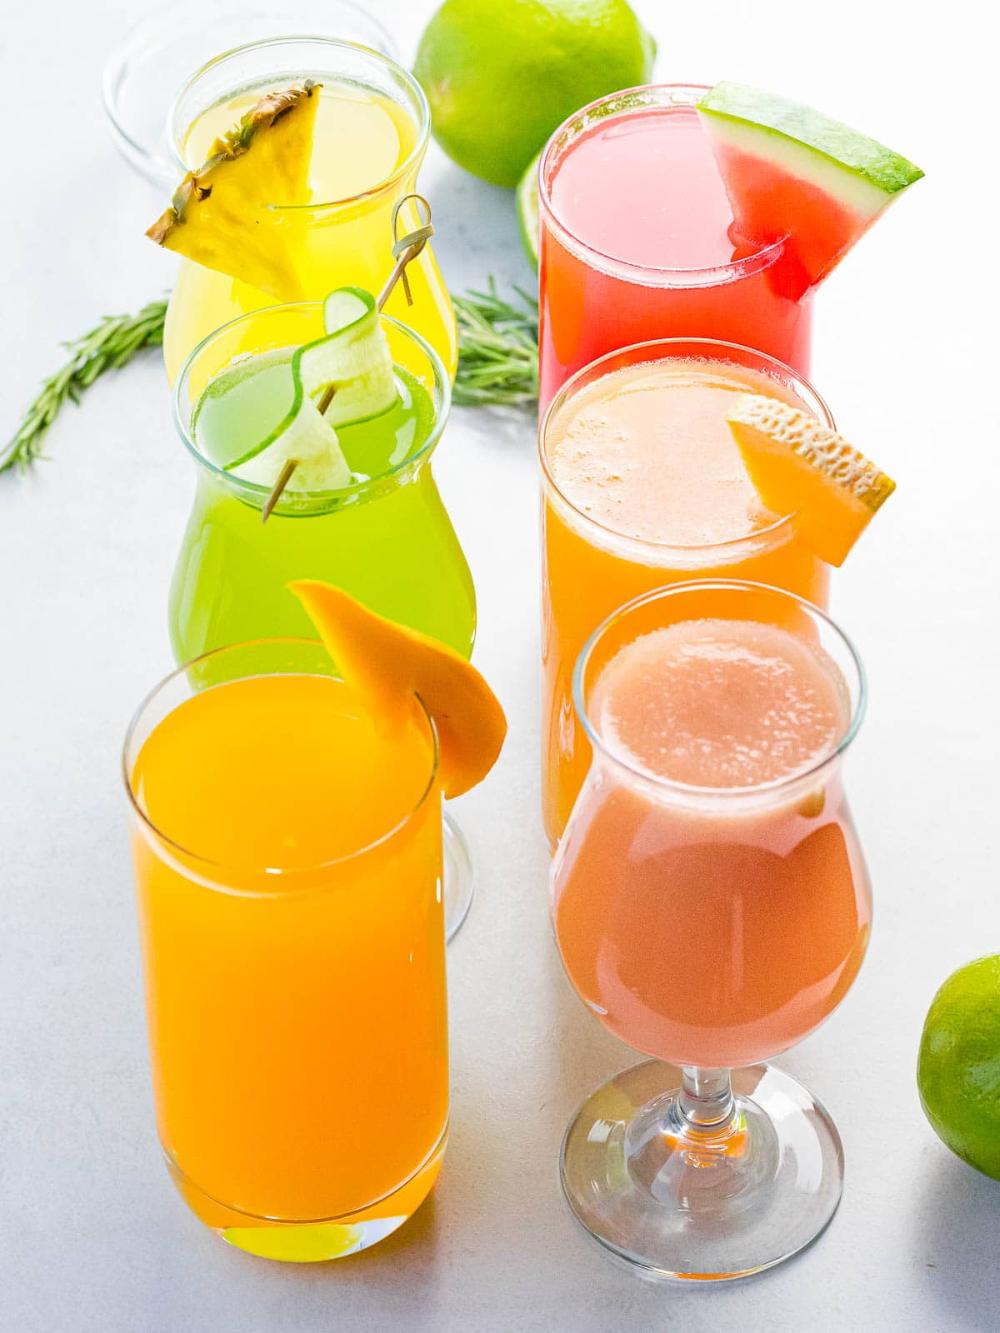 How To Make Aguas Frescas 7 Refreshing Flavors Recipe In 2020 Agua Fresca Best Non Alcoholic Drinks Agua Fresca Recipe